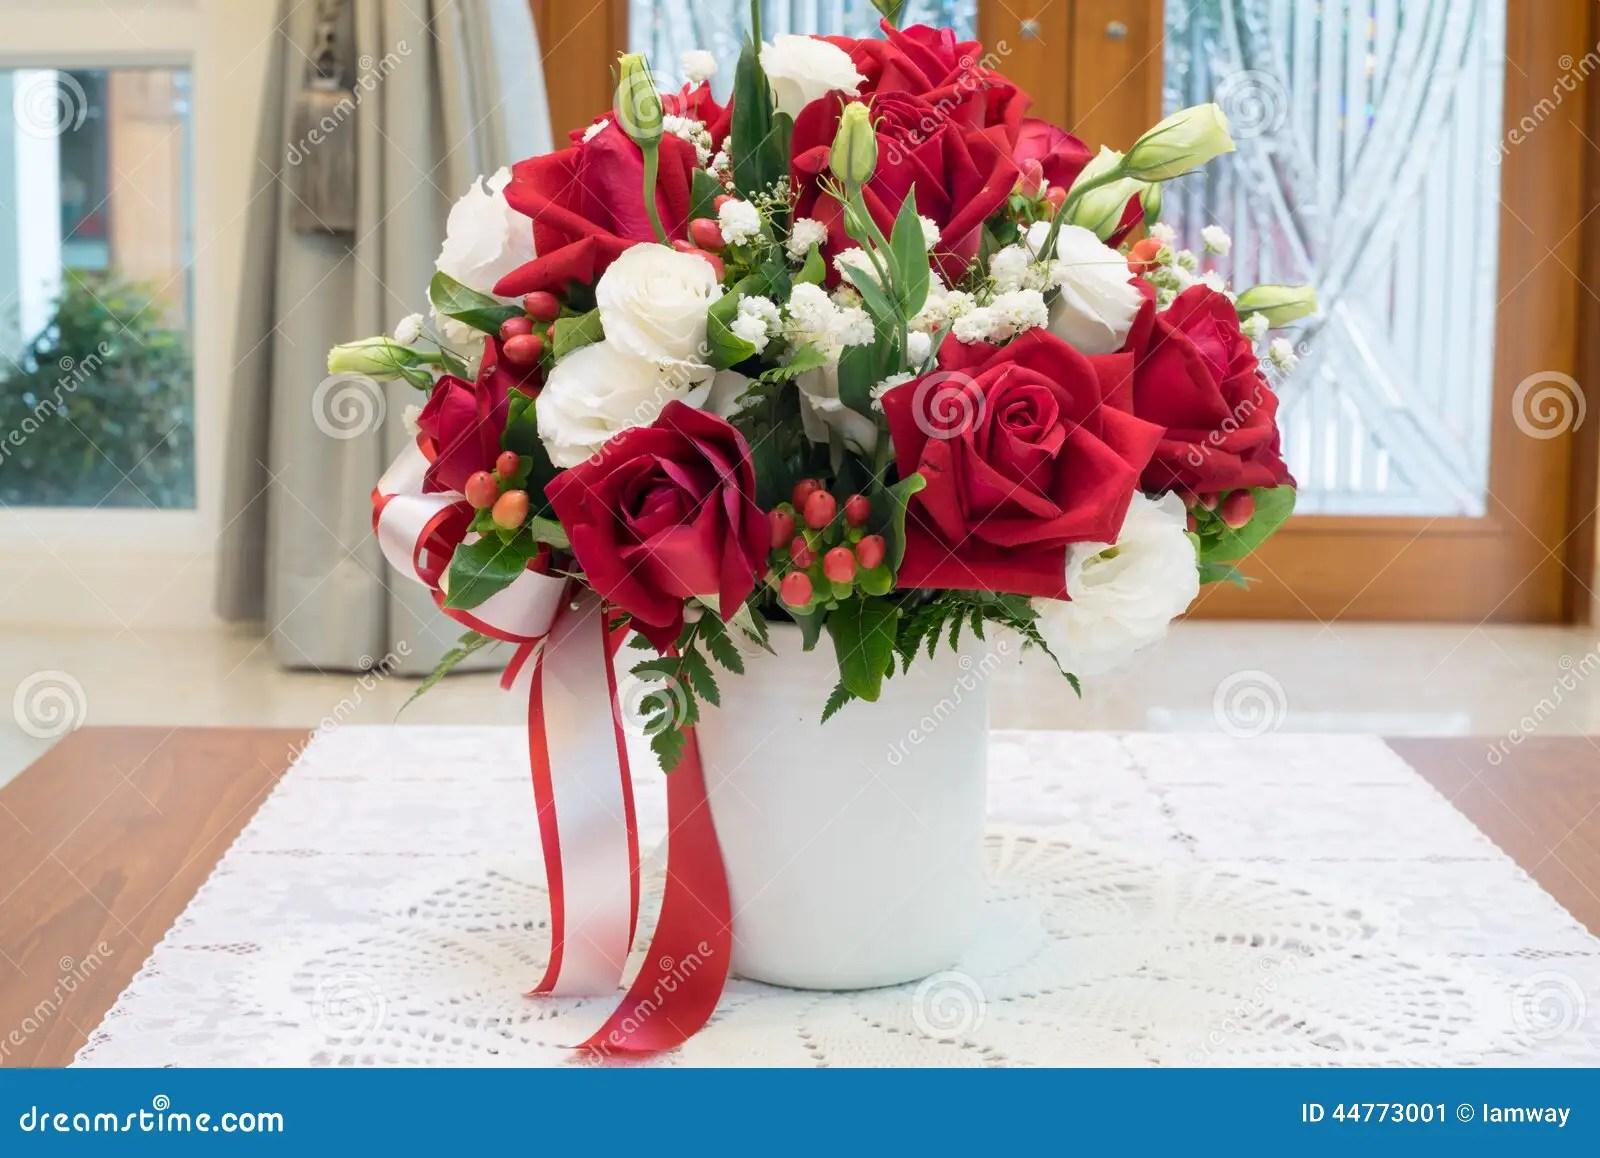 Roses Flowers Bouquet Inside Vase On Desk In House